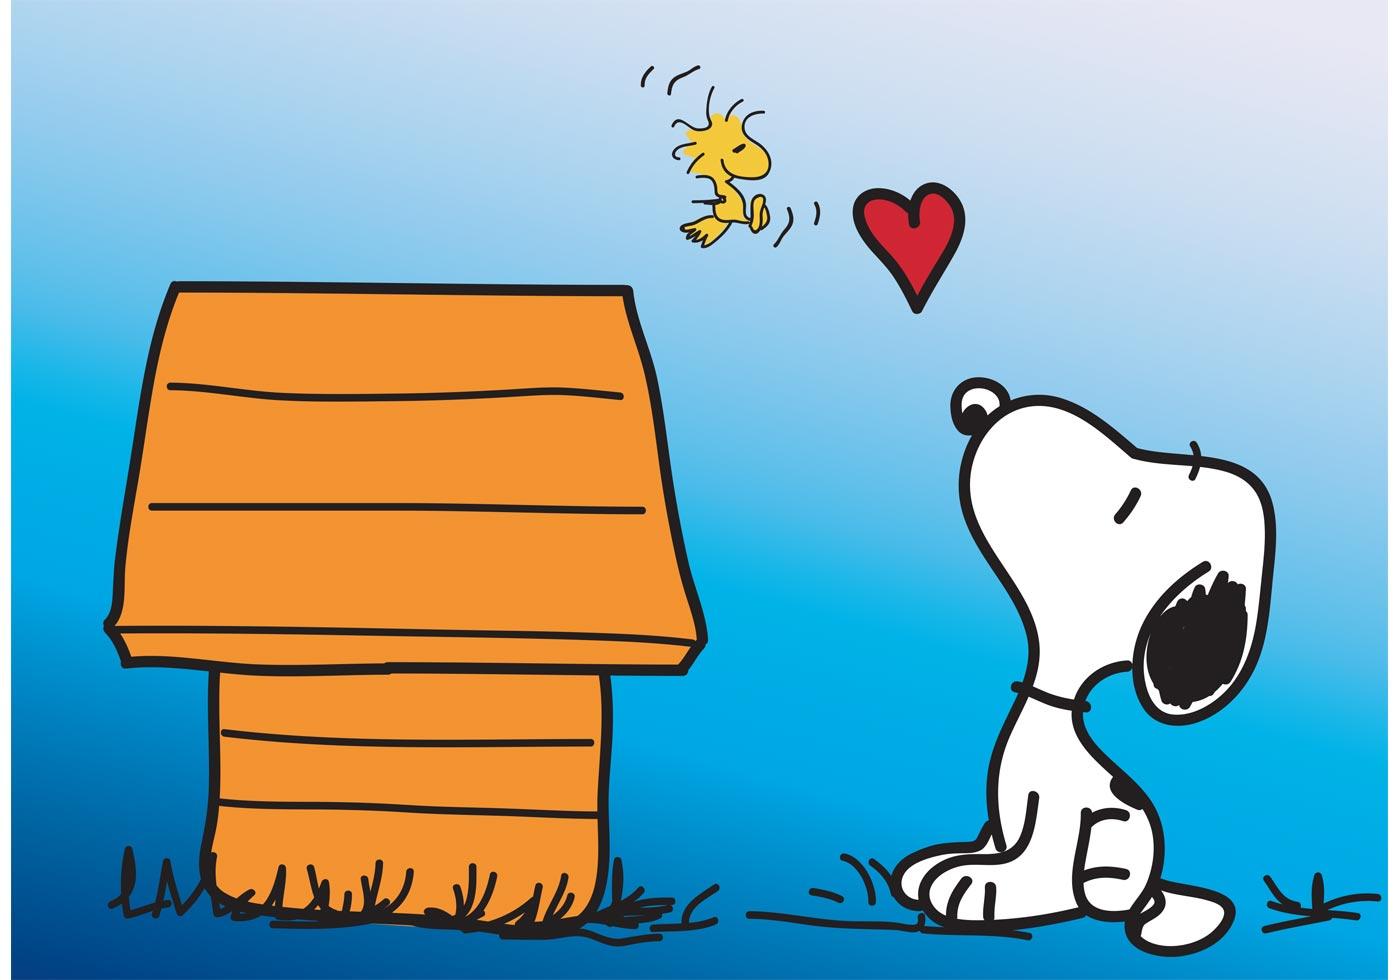 Cute Cartoon Horse Wallpaper Snoopy Vector Card Download Free Vector Art Stock